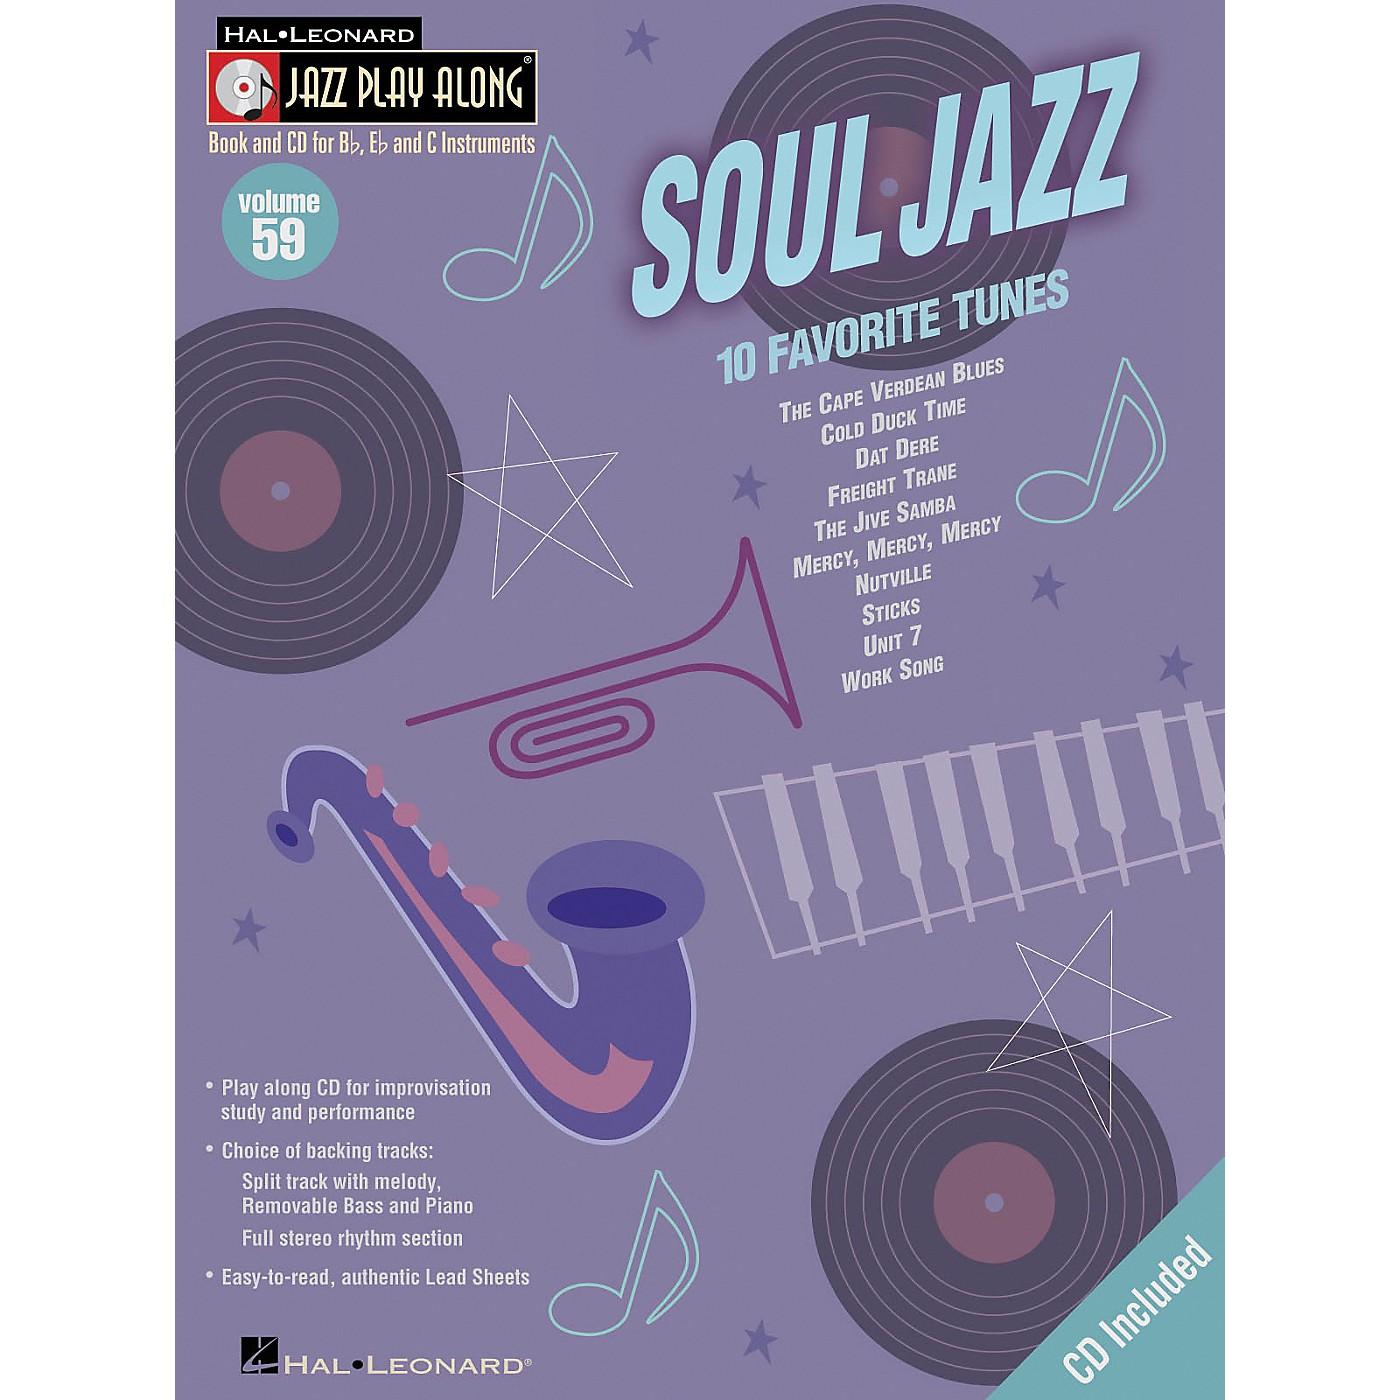 Hal Leonard Soul Jazz - Jazz Play Along Volume 59 Book with CD thumbnail